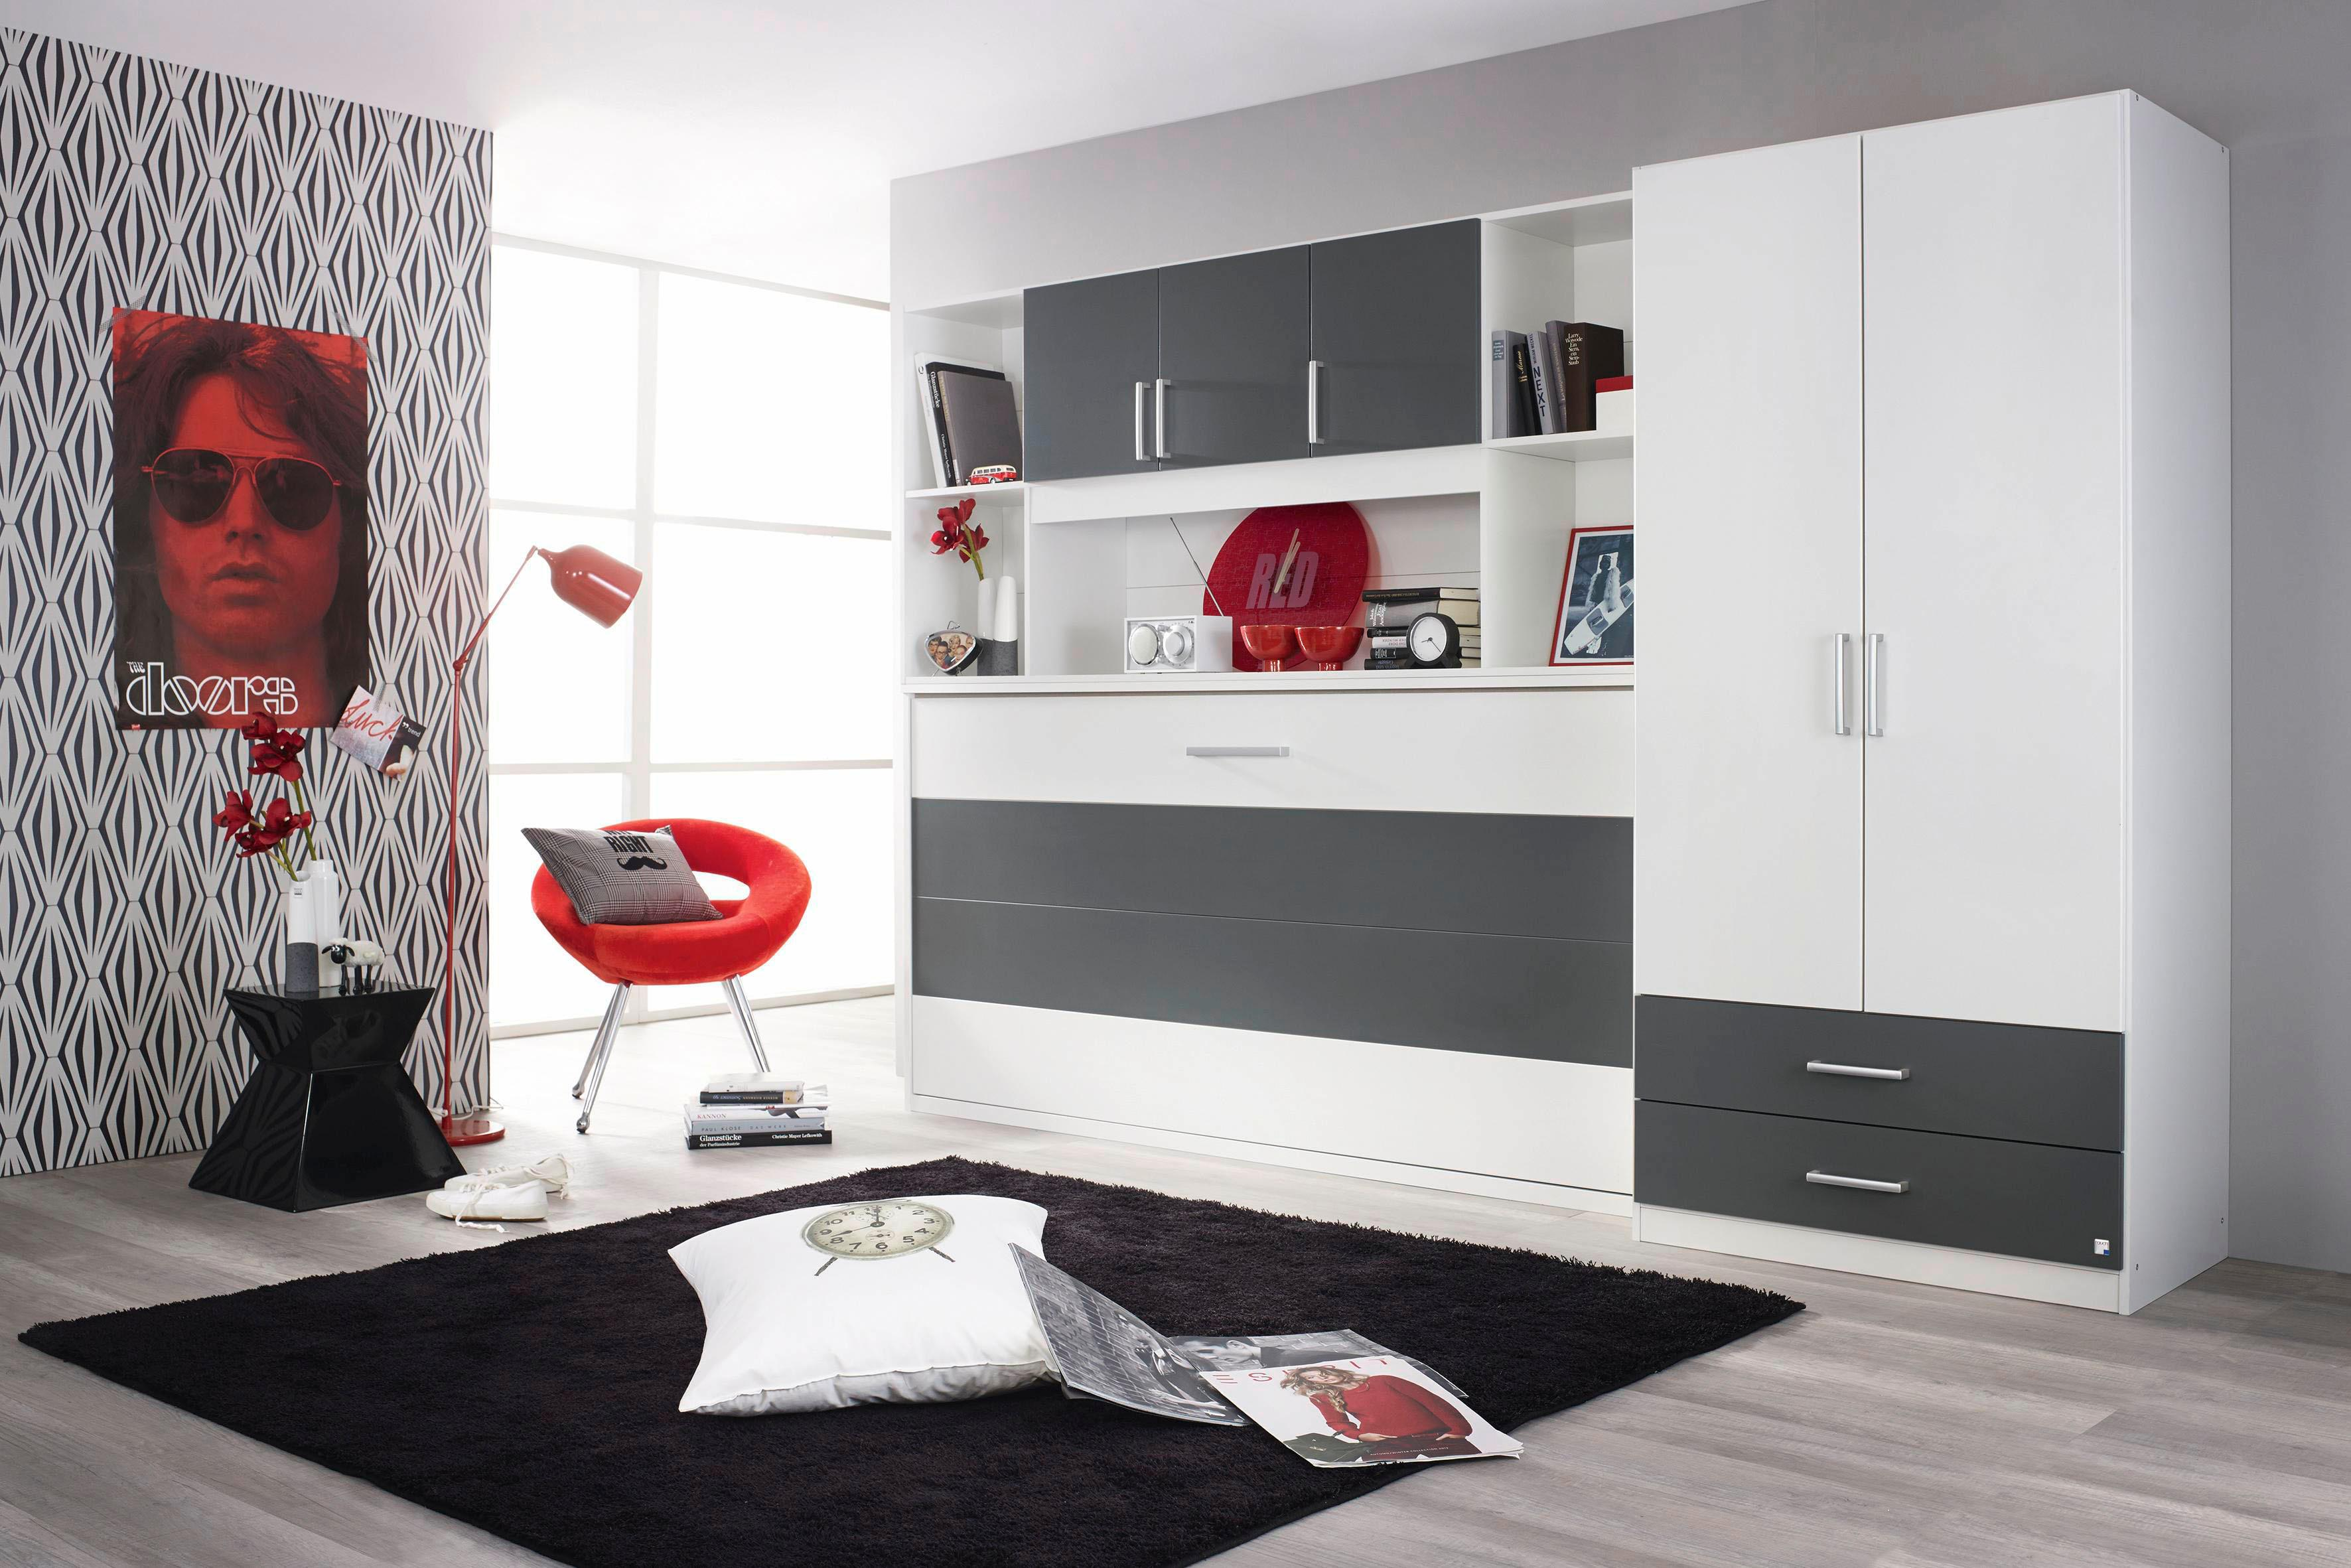 rauch pack s kleiderschrank albero cafe konrad vib. Black Bedroom Furniture Sets. Home Design Ideas